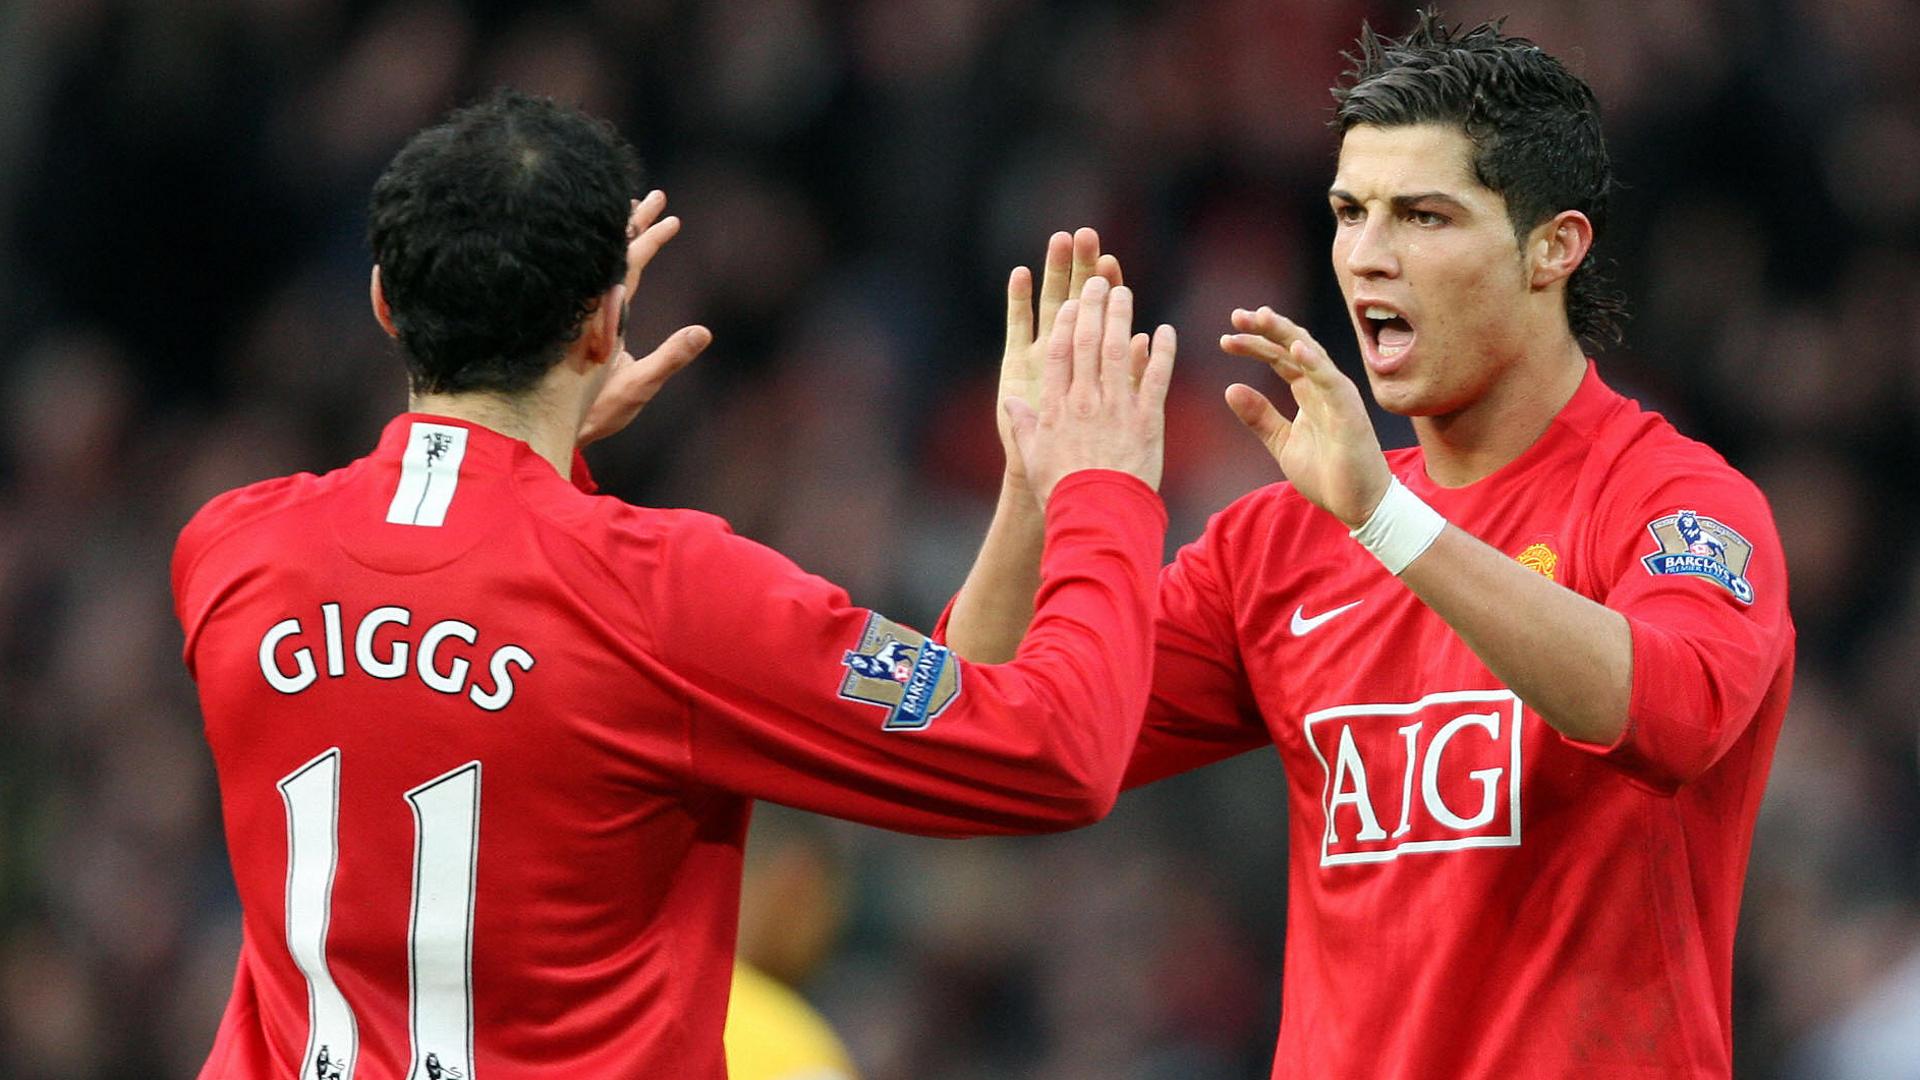 Cristiano Ronaldo Ryan Giggs Manchester United